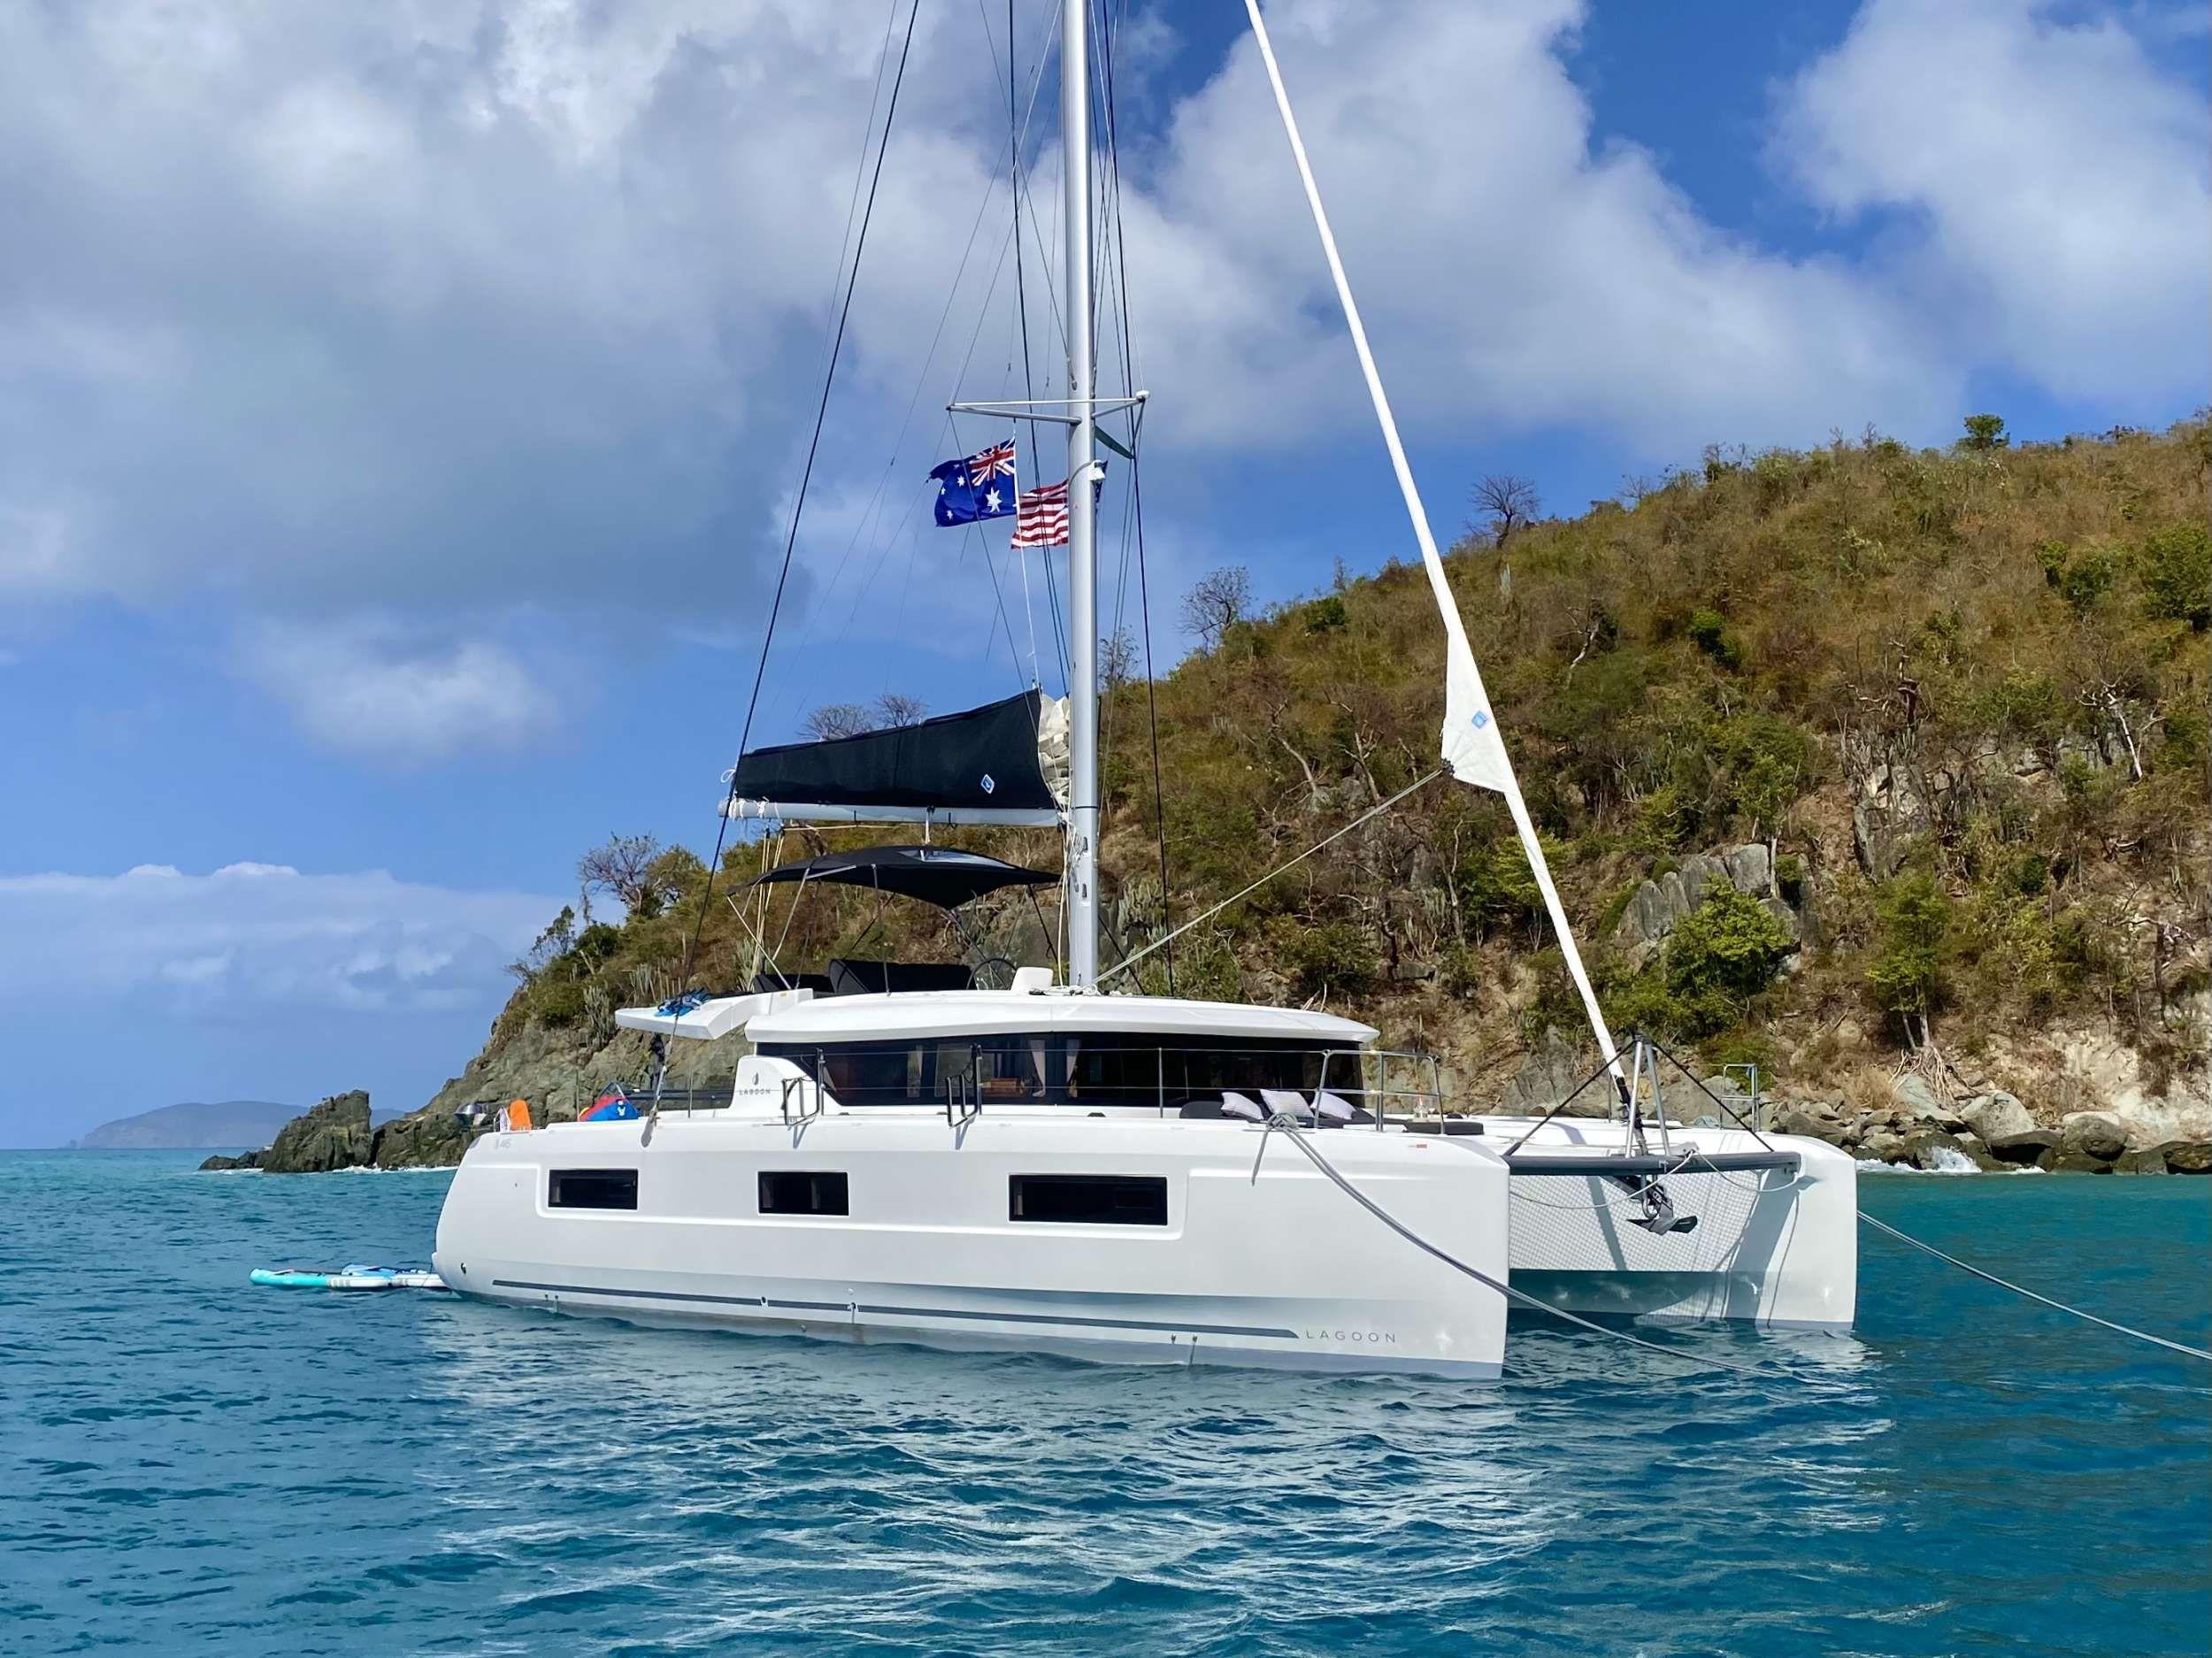 EASIR II - Lagoon 46 - 3 Cabins - Tortola - St Thomas - St John - Virgin Gorda - Anegada